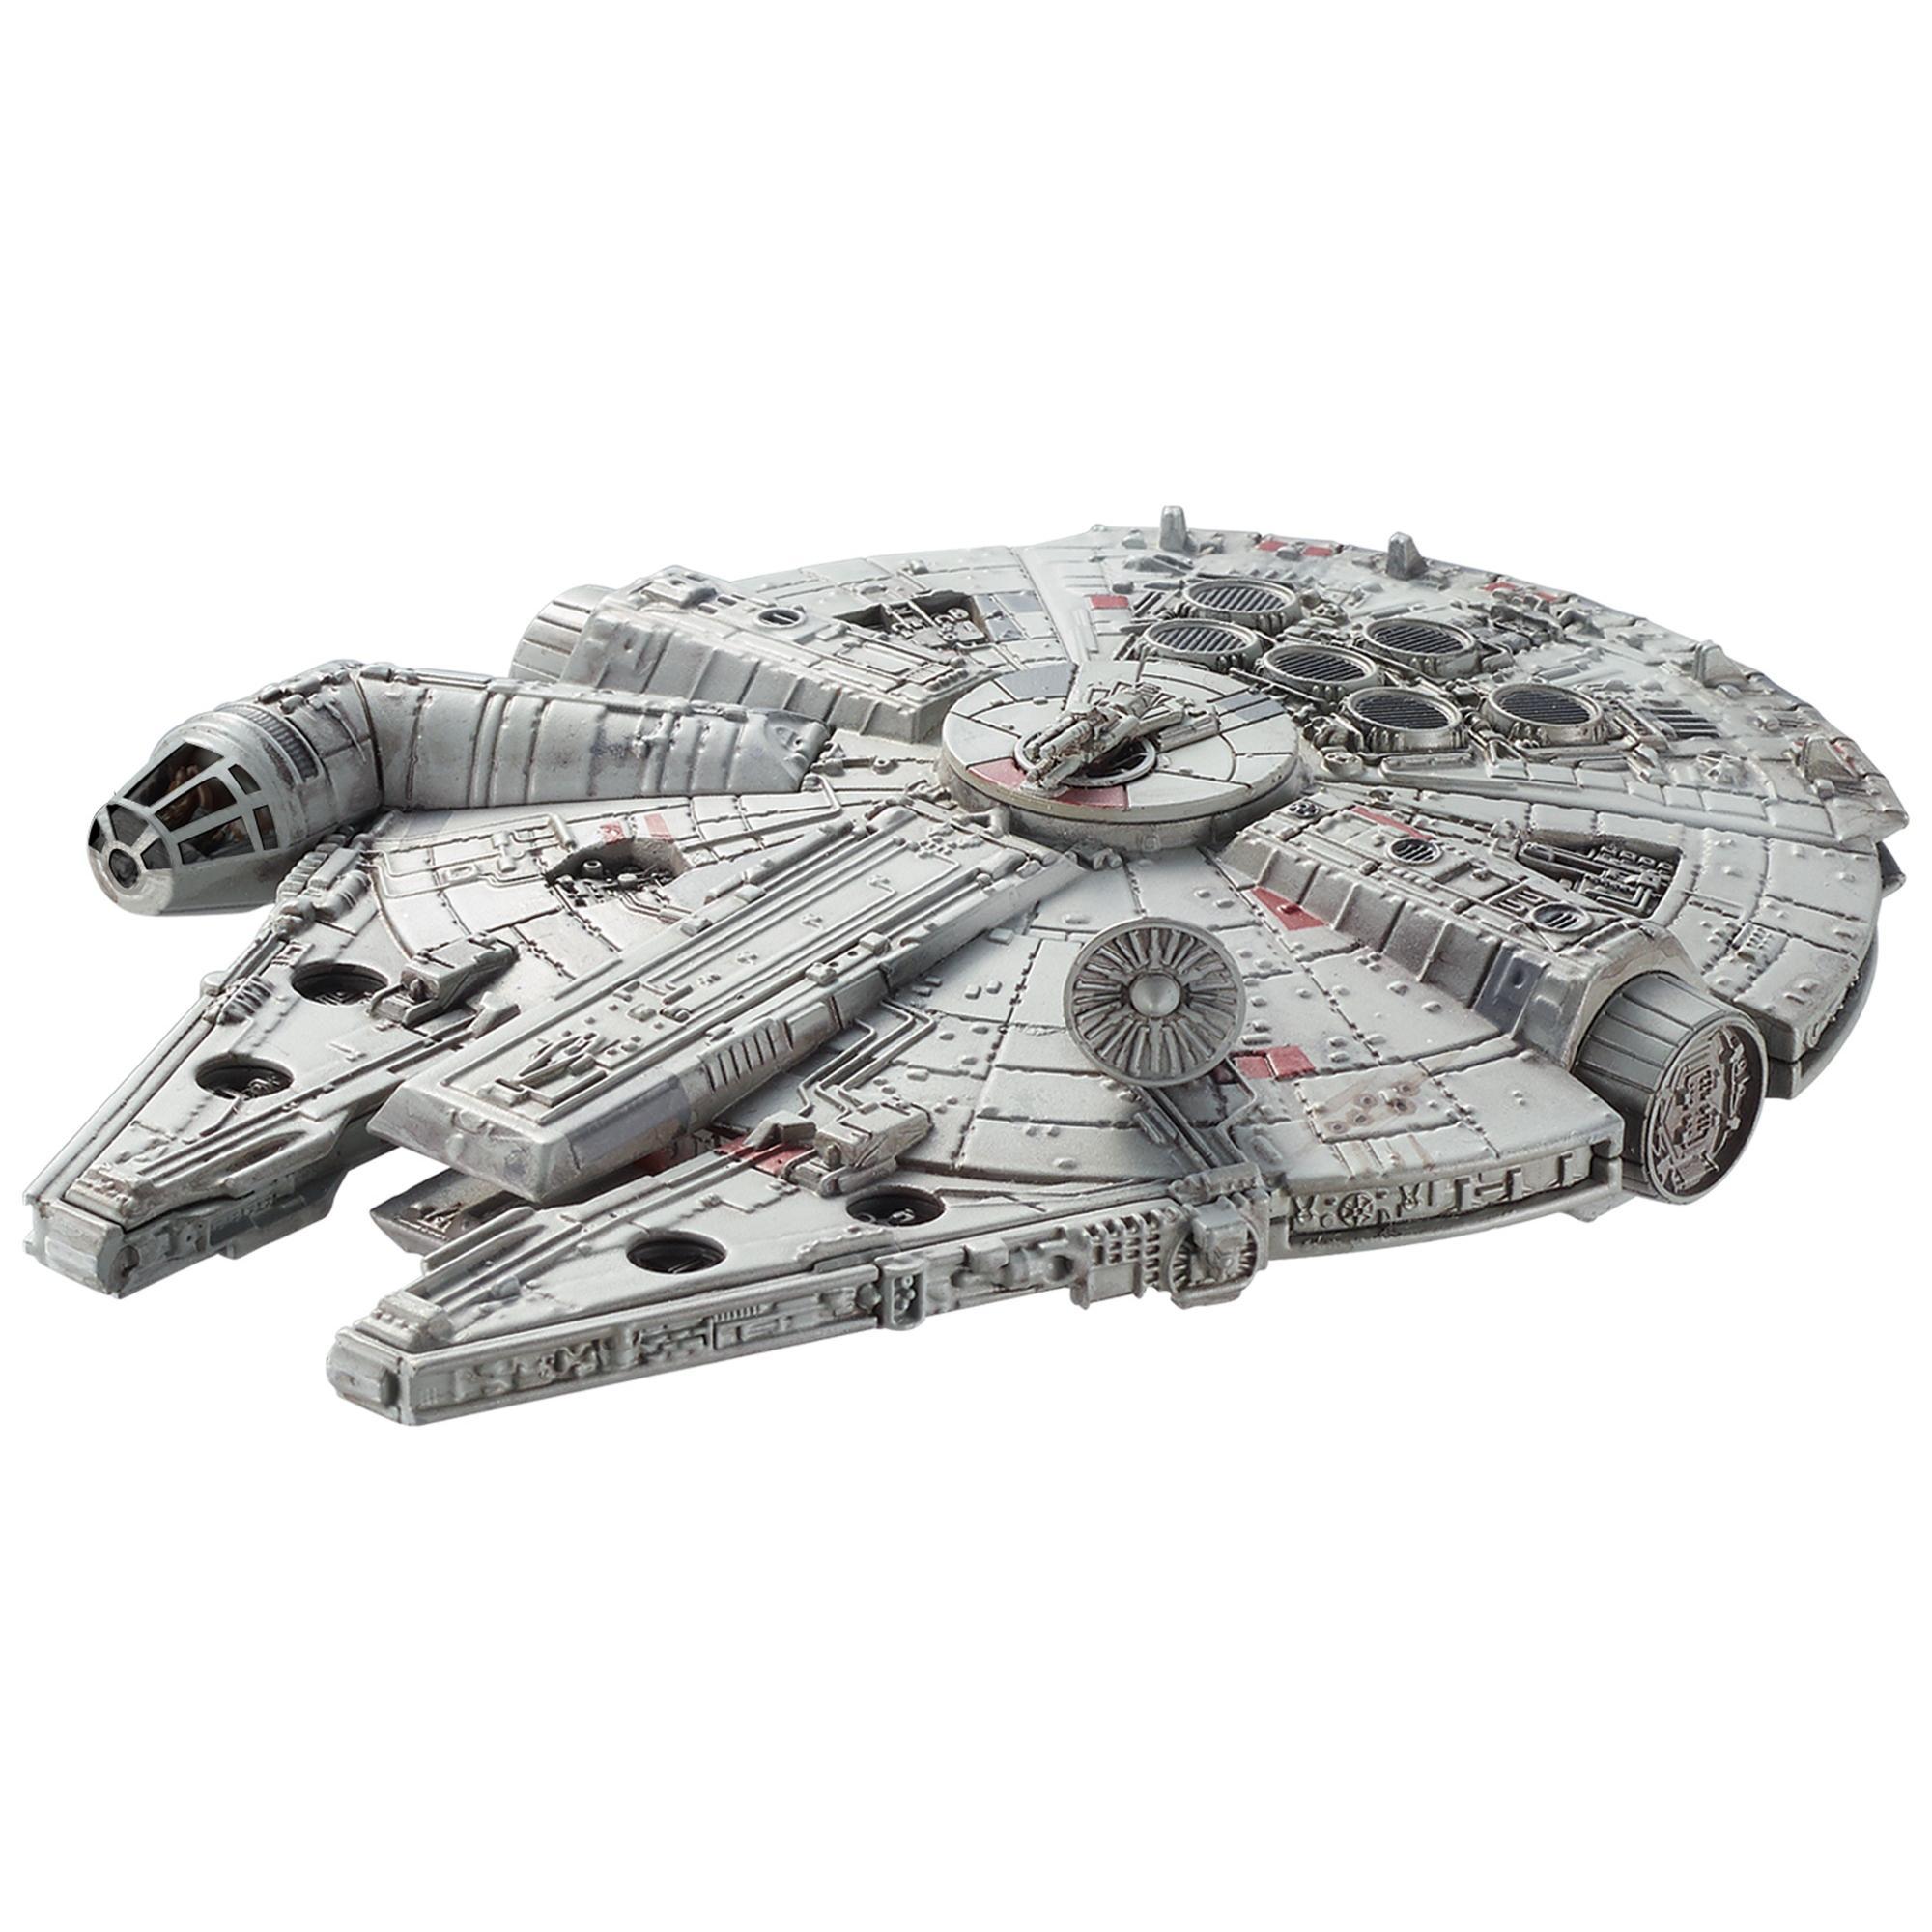 ANH HW Millennium Falcon Adventure Starship 1